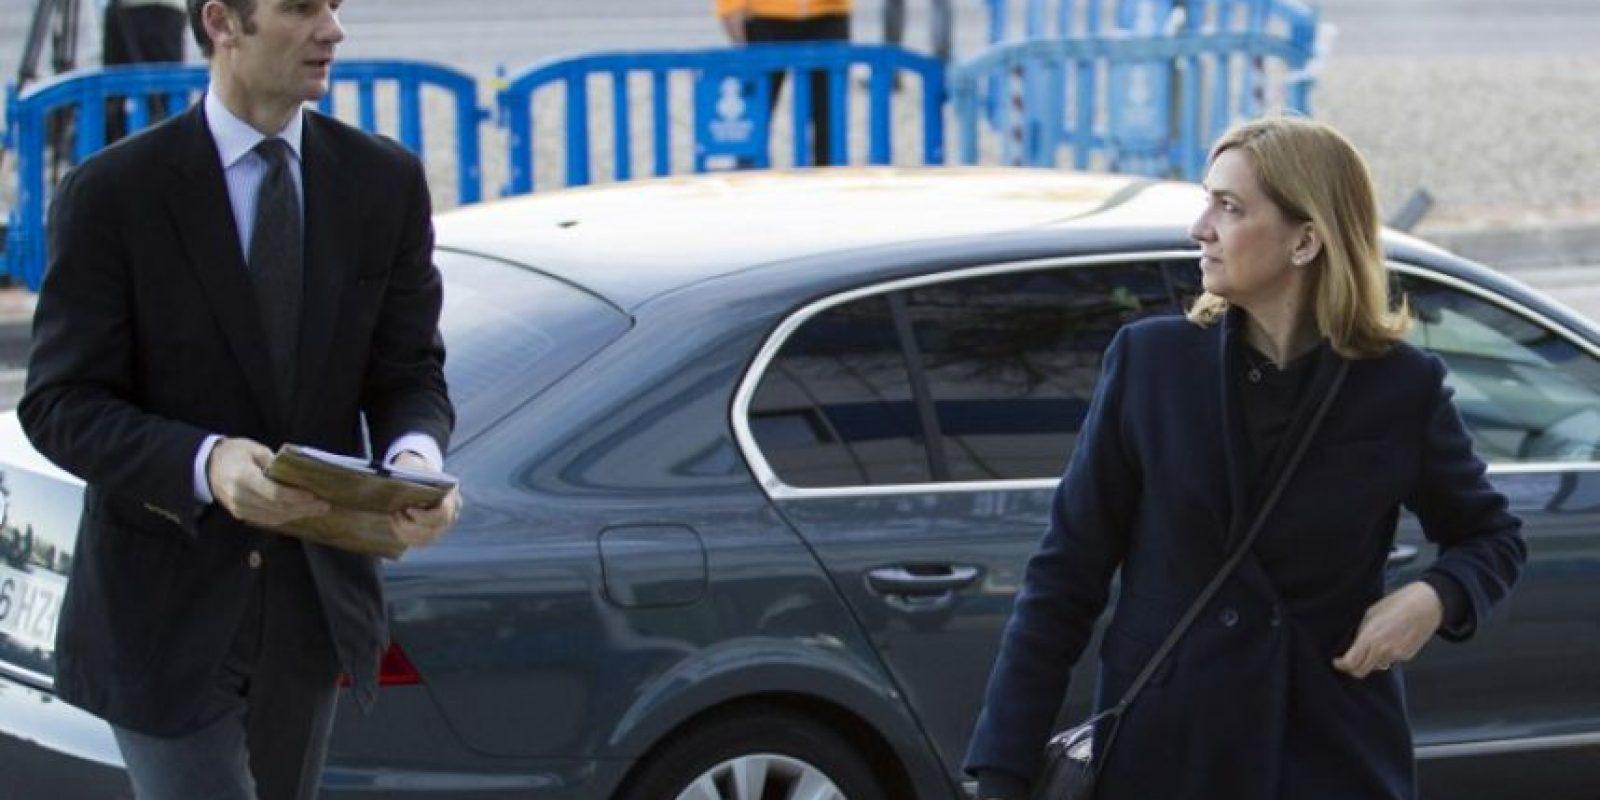 En el que se acusa a Iñaki Urdangarin, esposo de la infanta Cristina de España. Foto:AFP